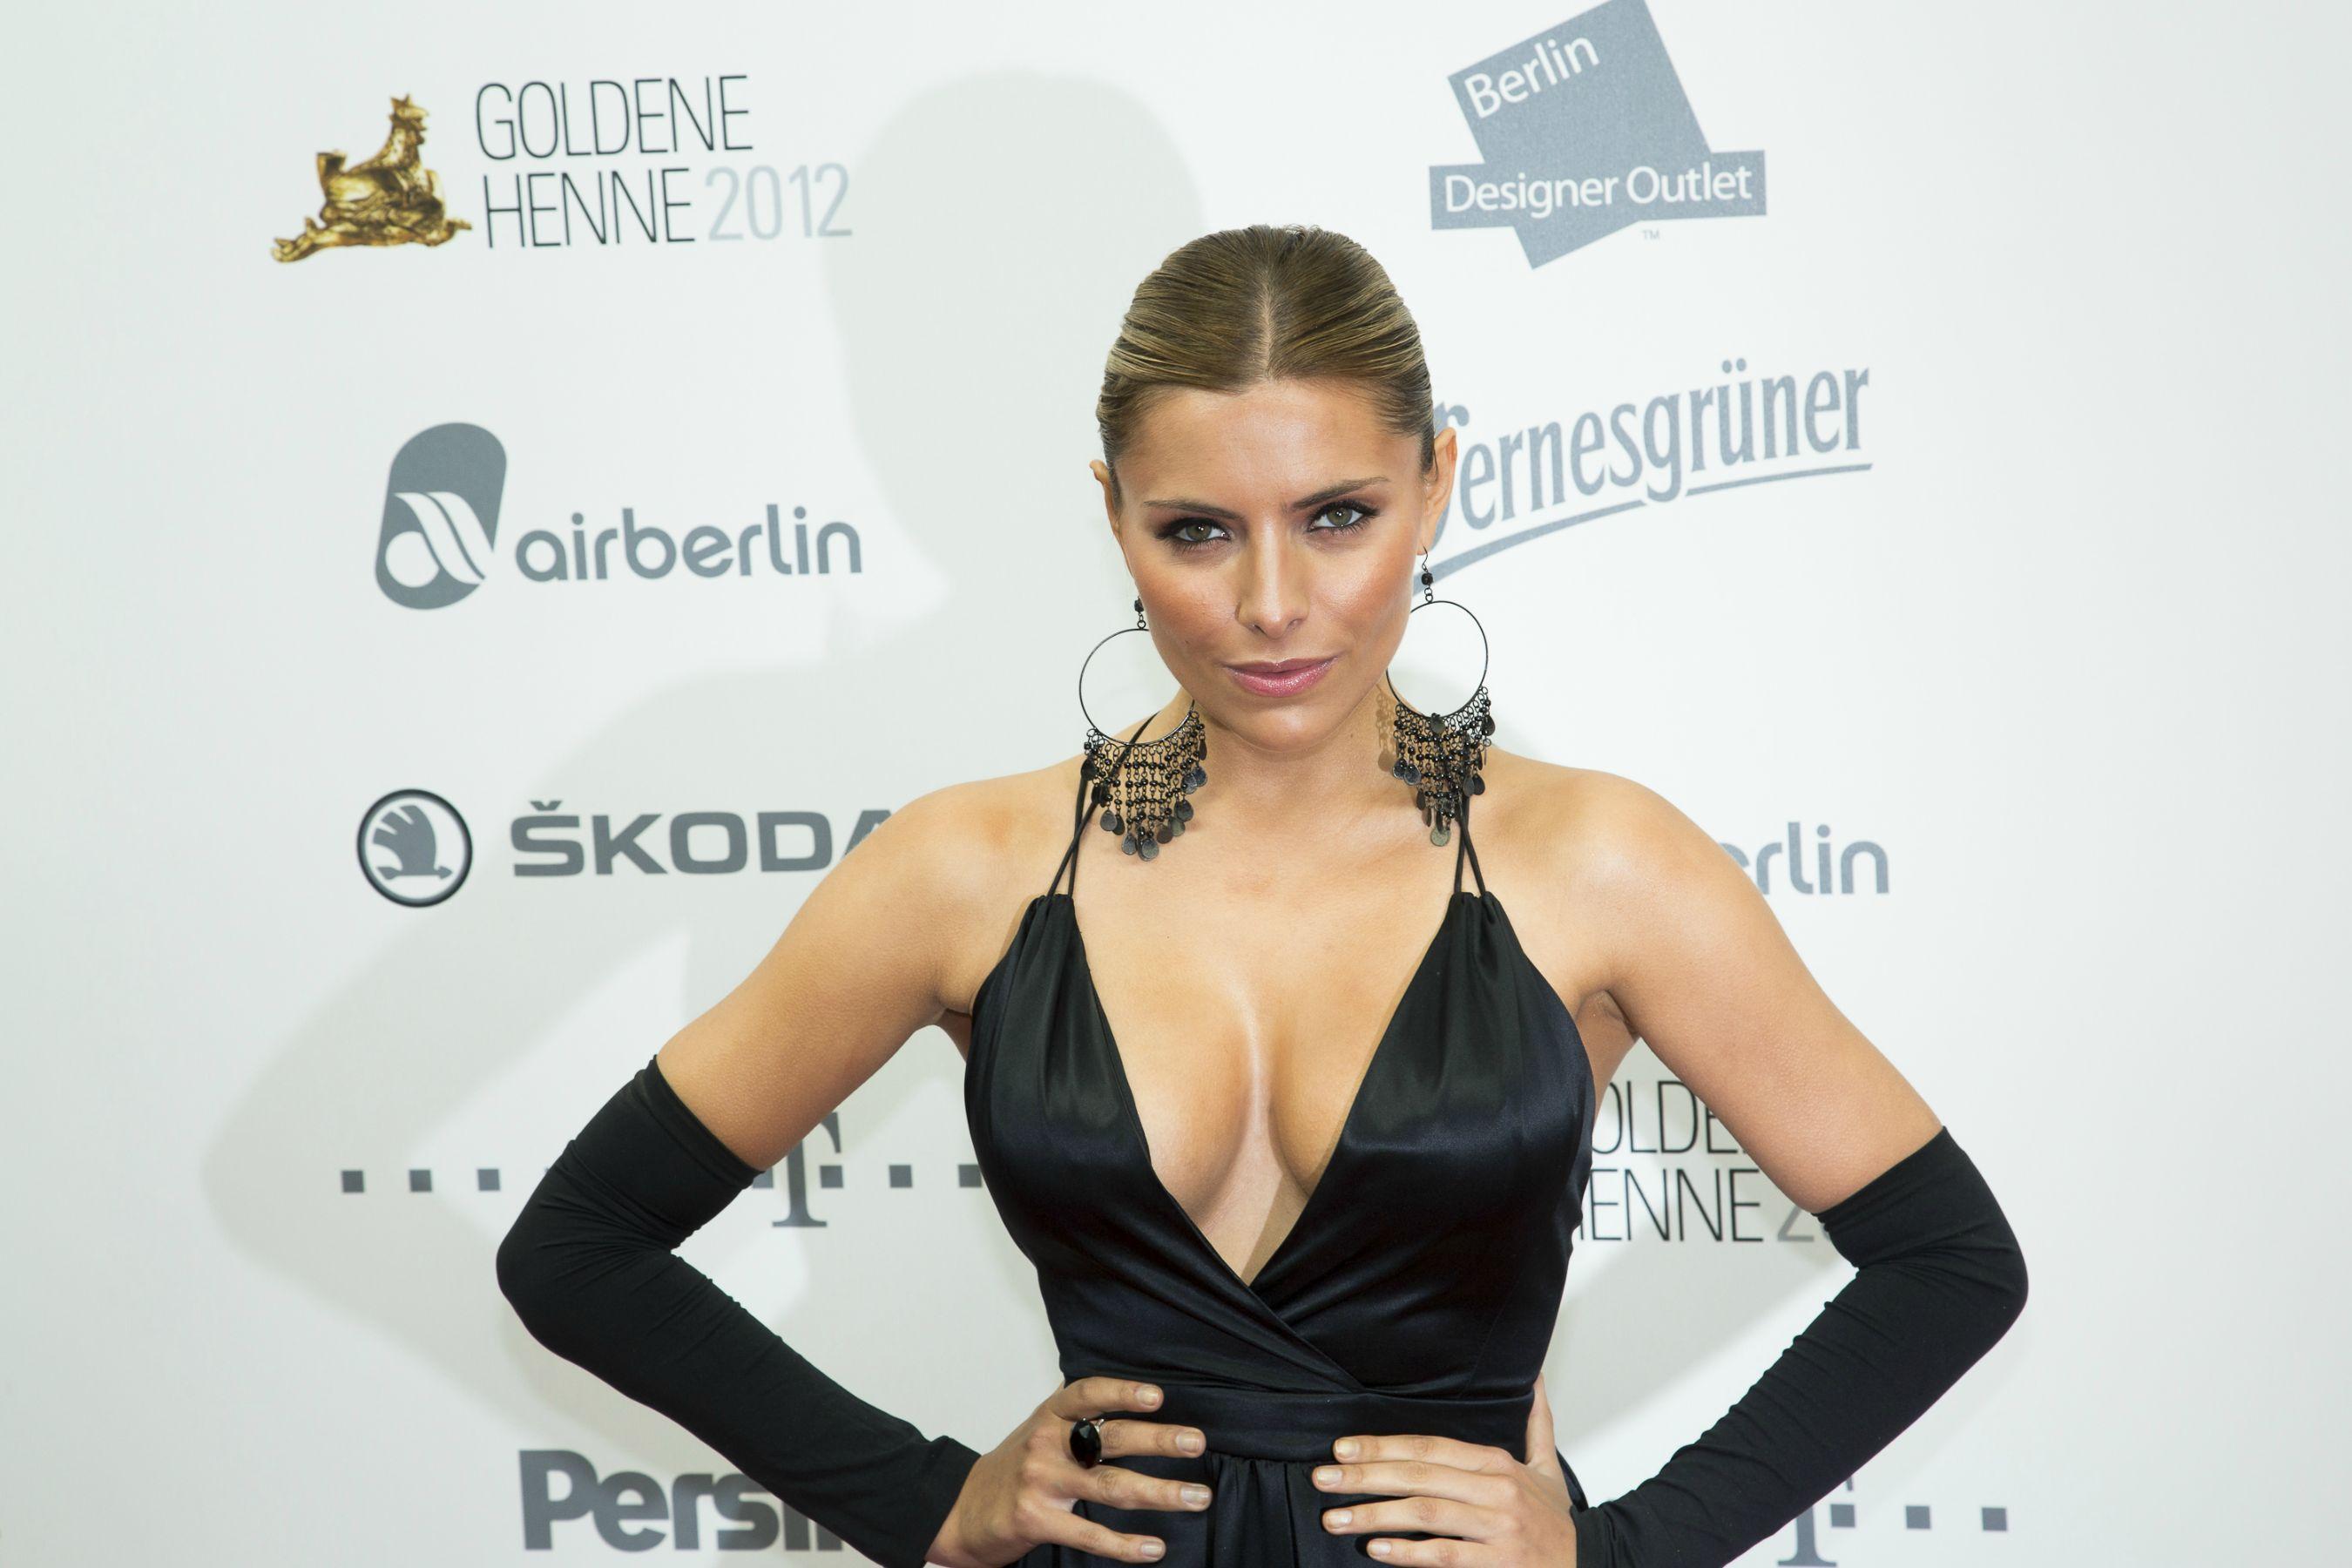 Sophia Thomalla, Beste Pose